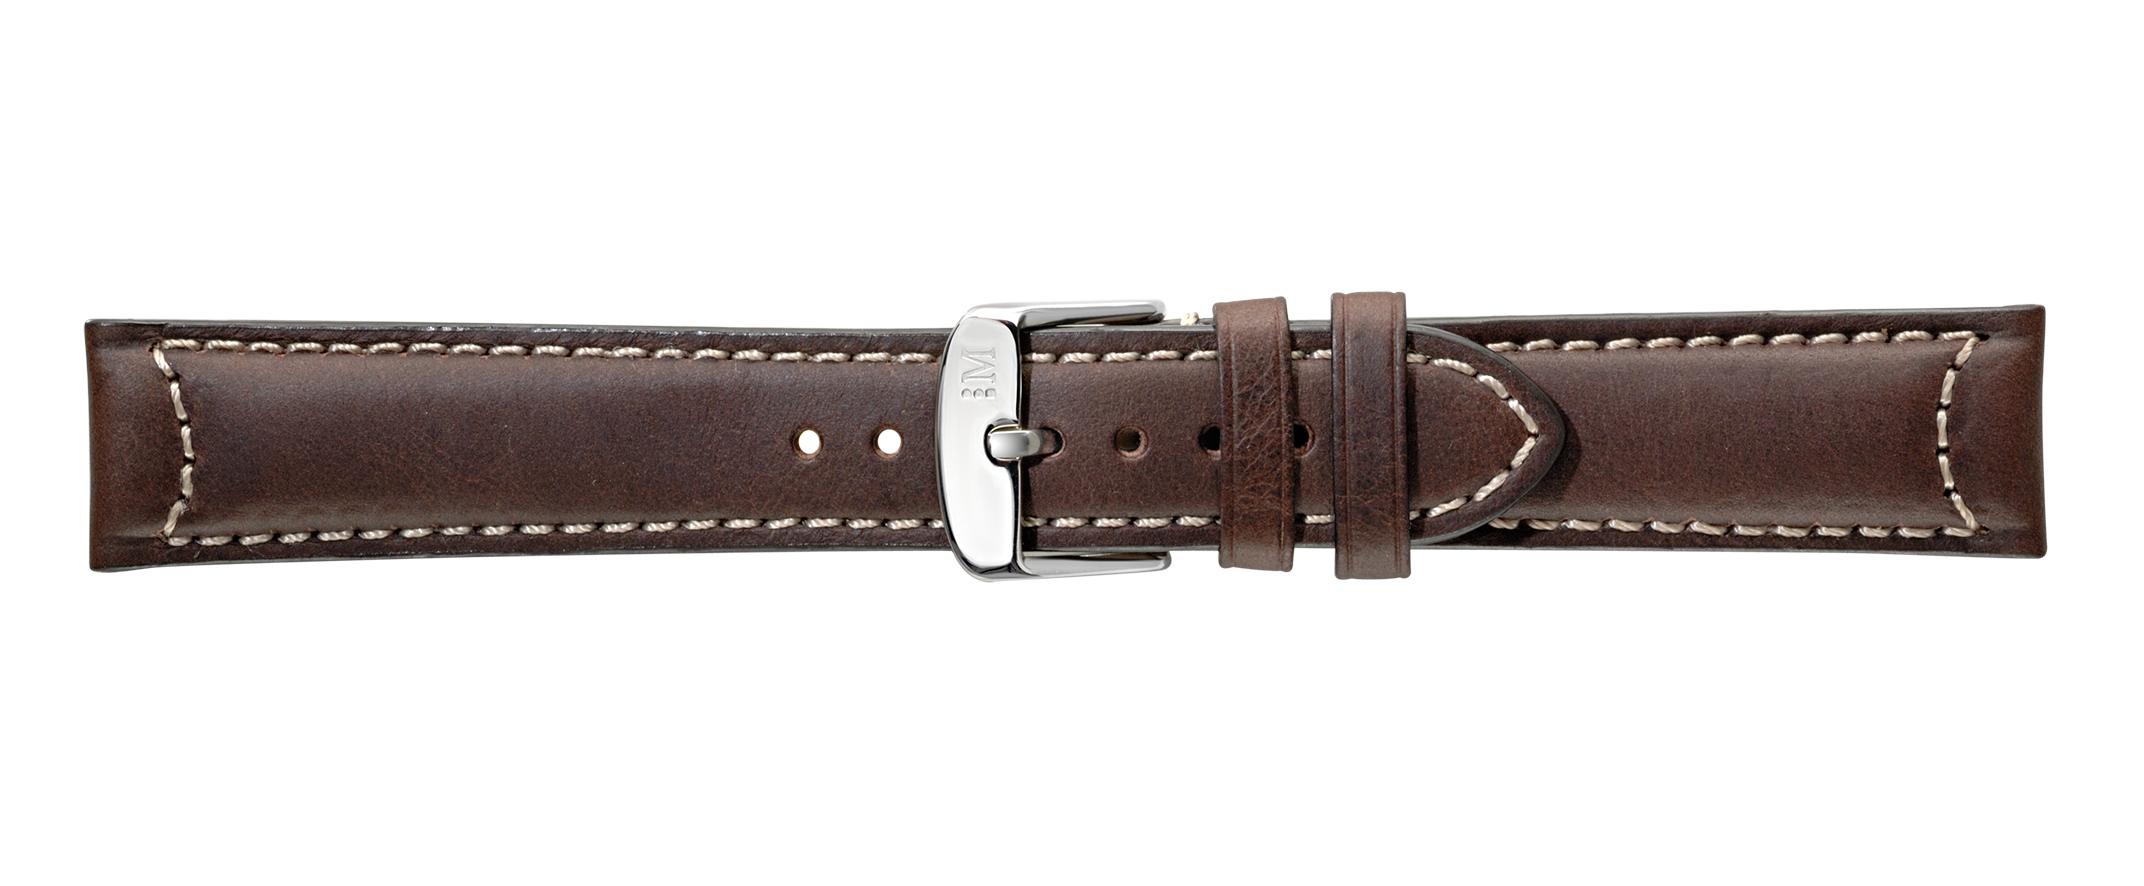 Morellato horlogeband Cezanne Hide X4273B09032CR22 / PMX032CEZANN22 Glad leder Bruin 22mm + wit stiksel